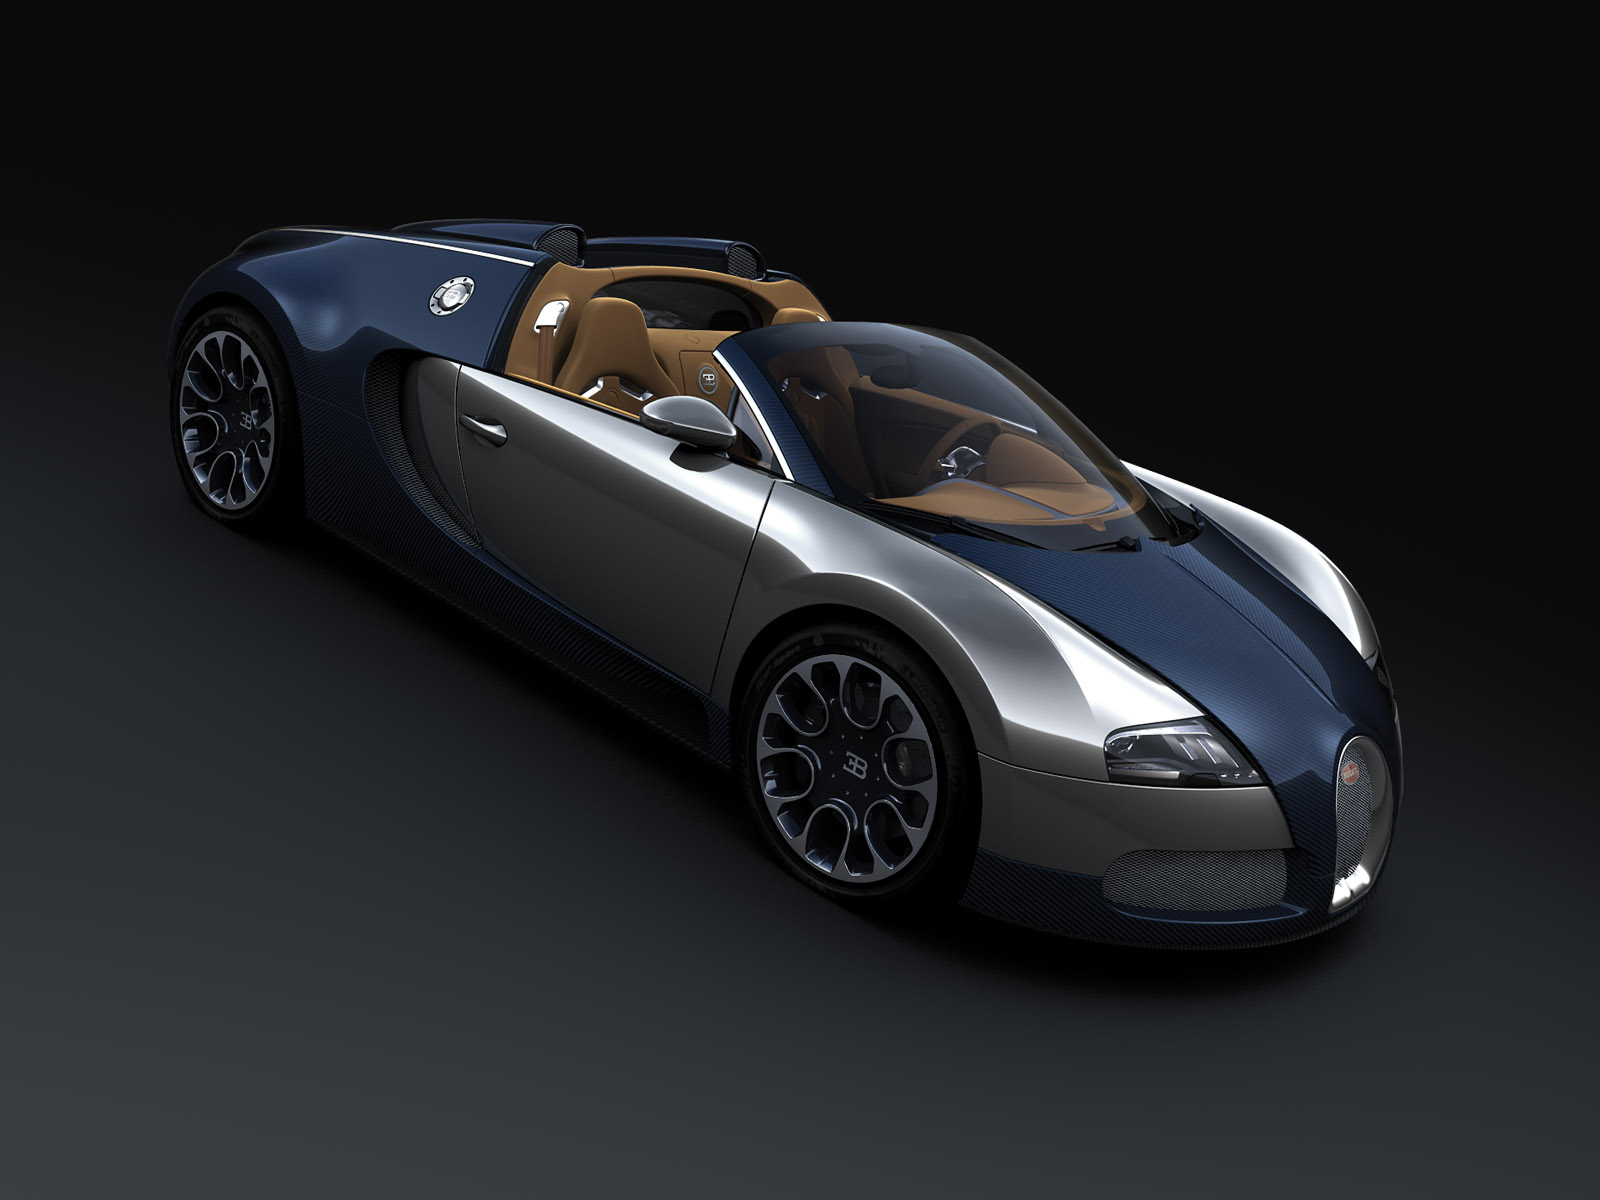 bugatti-sang-bleu-grand-sport-revealed_3 Gorgeous Bugatti Veyron Grand Sport Vitesse Bleu Cars Trend